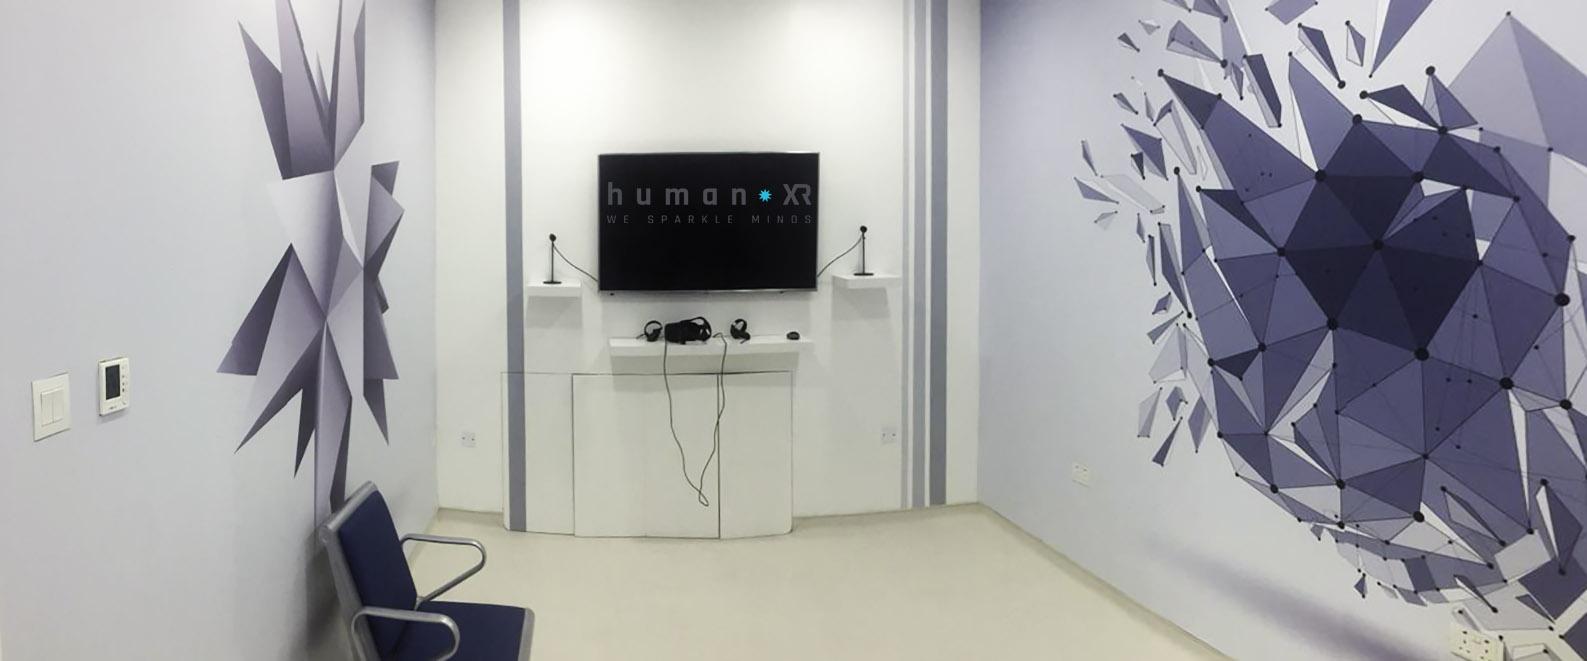 HumanXR VR room revalidatie ziekenhuis Dubai